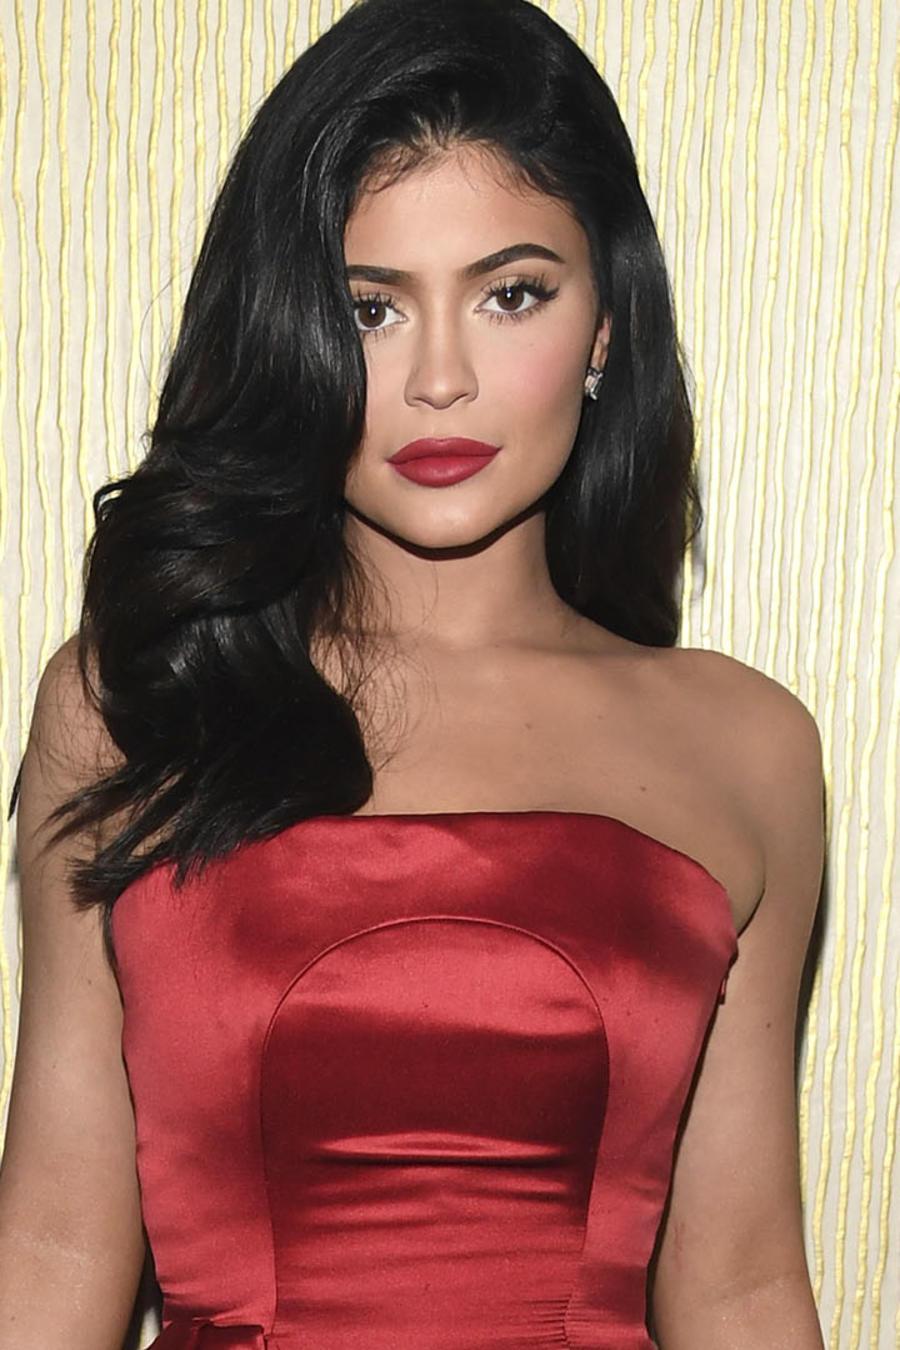 Kylie Jenner mostrando su cintura